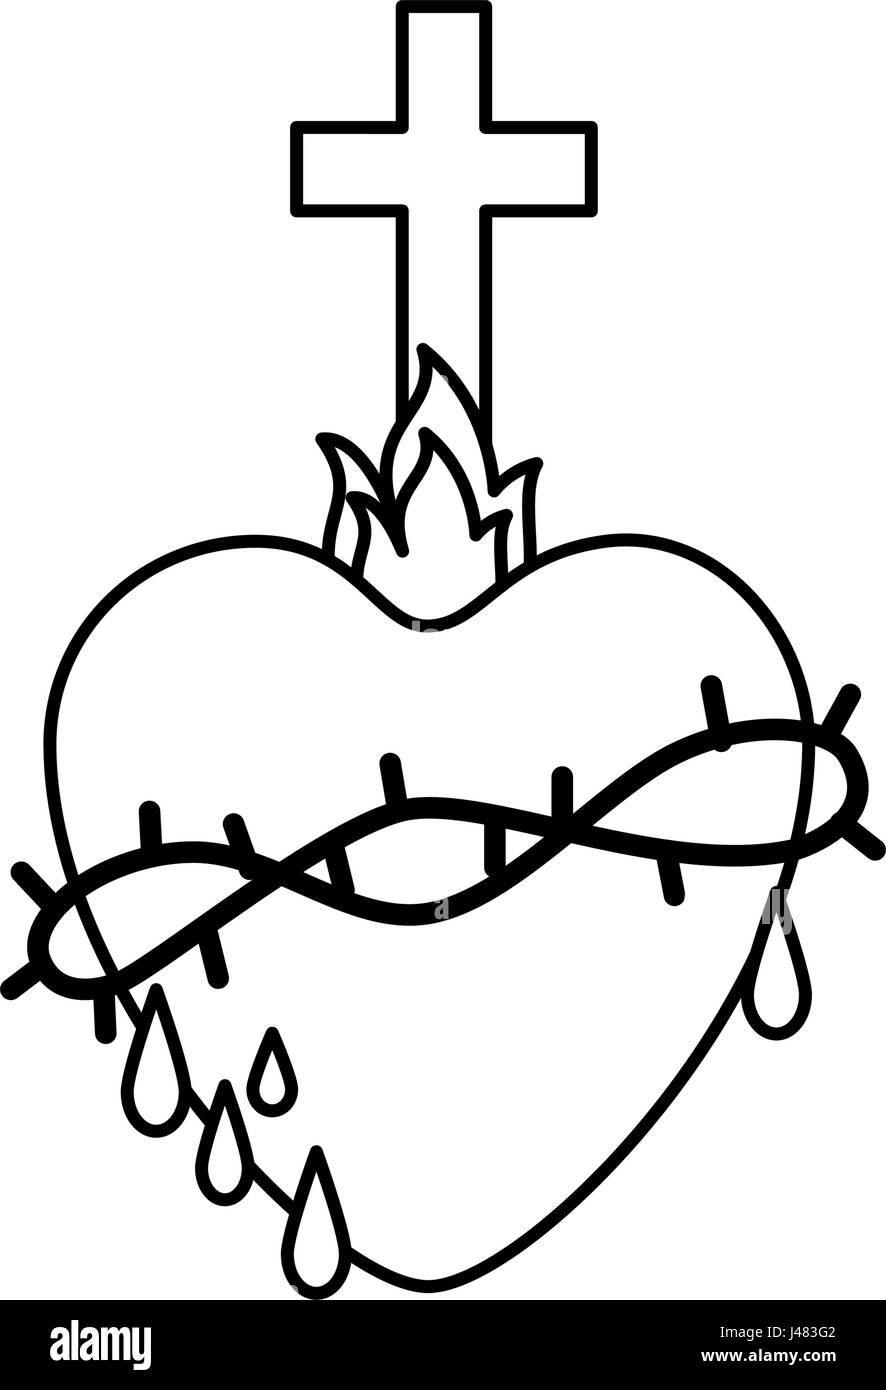 religion symbols black and white stock photos images alamy Middle East Farming sacred heart icon stock image